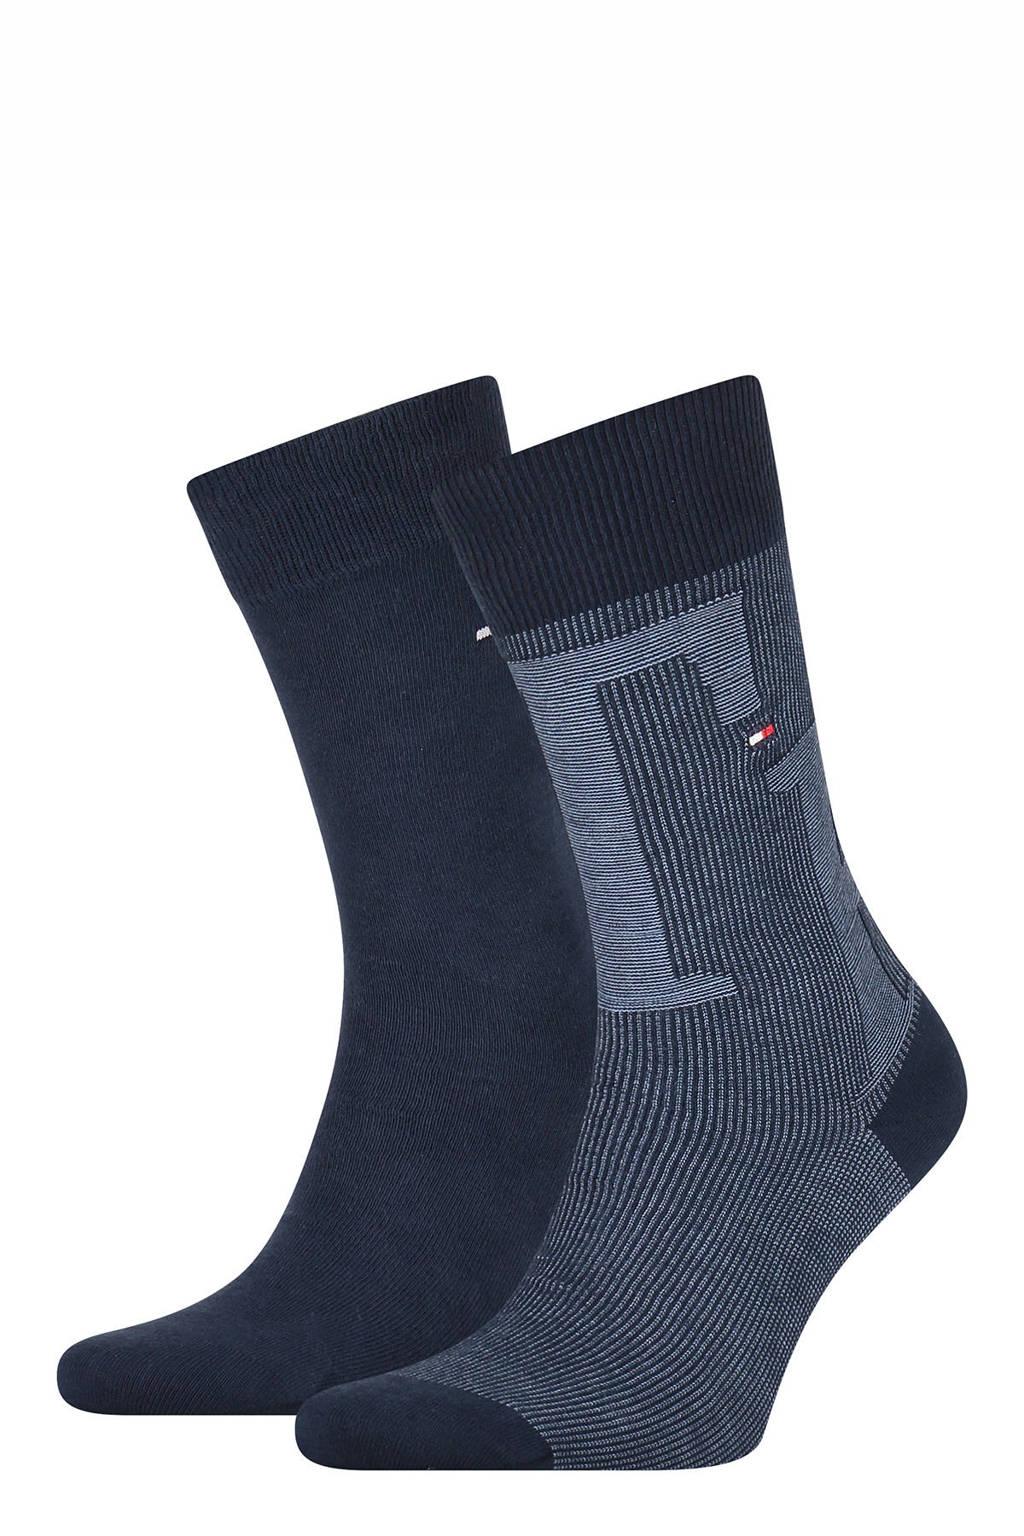 Tommy Hilfiger sokken - set van 2 donkerblauw, Donkerblauw